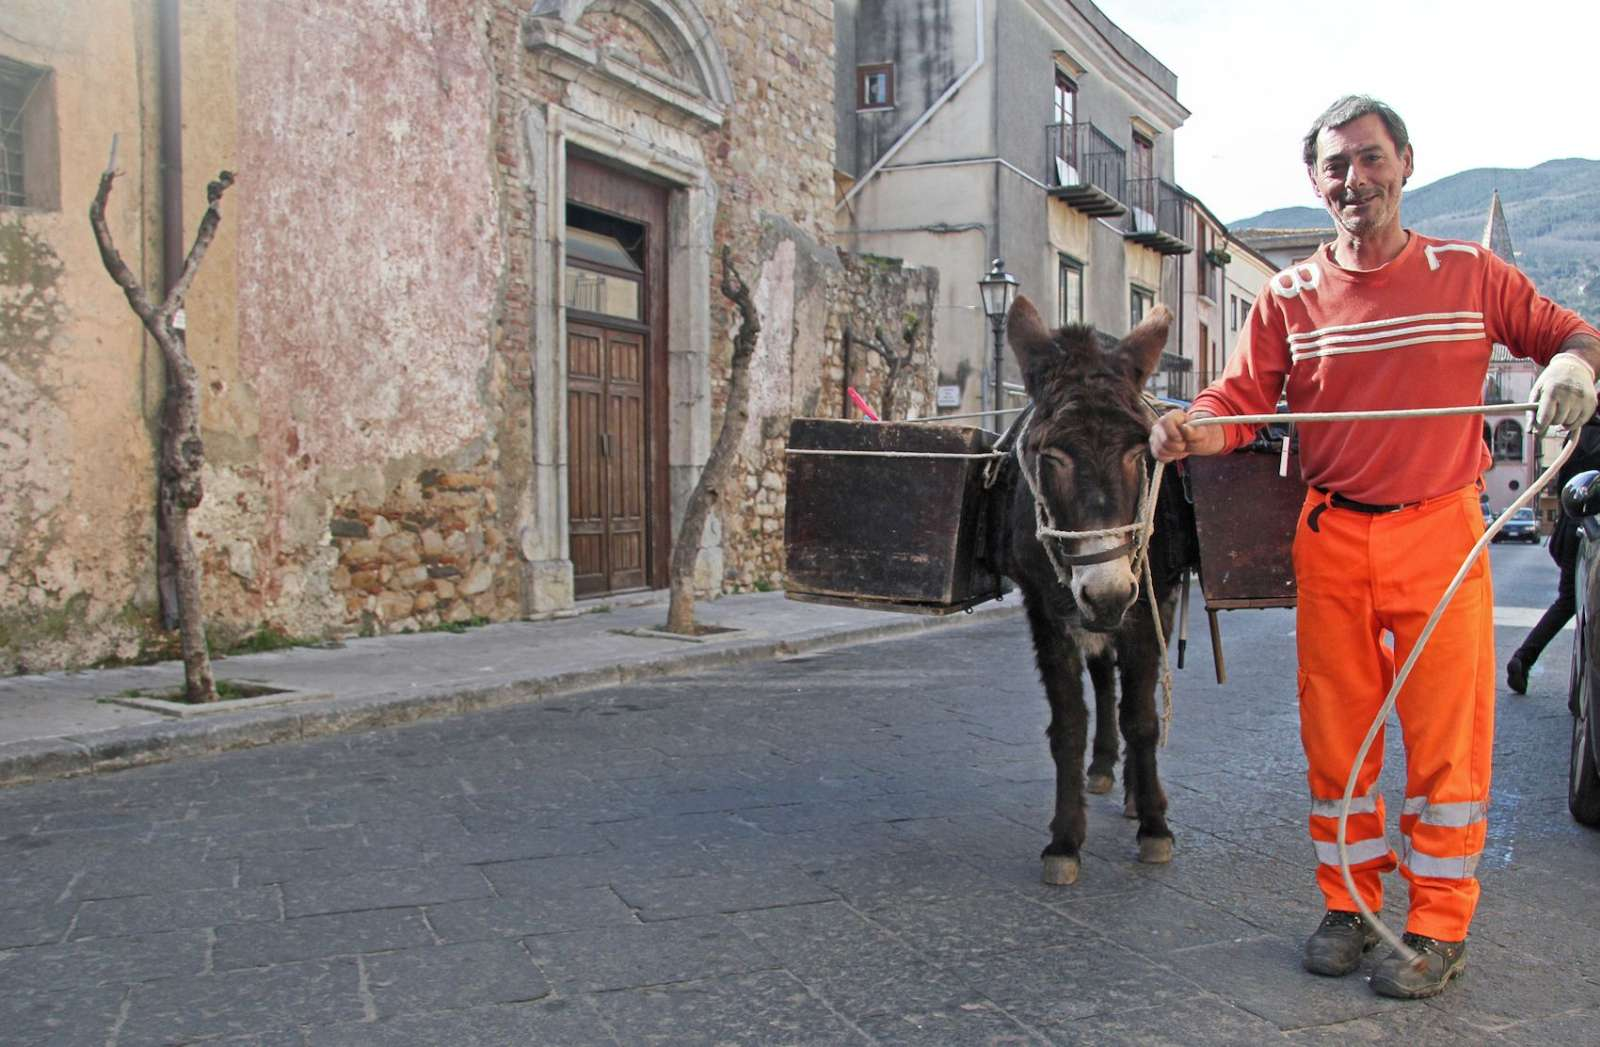 Mario dirige l'ânesse Valentina dans les ruelles de la ville.